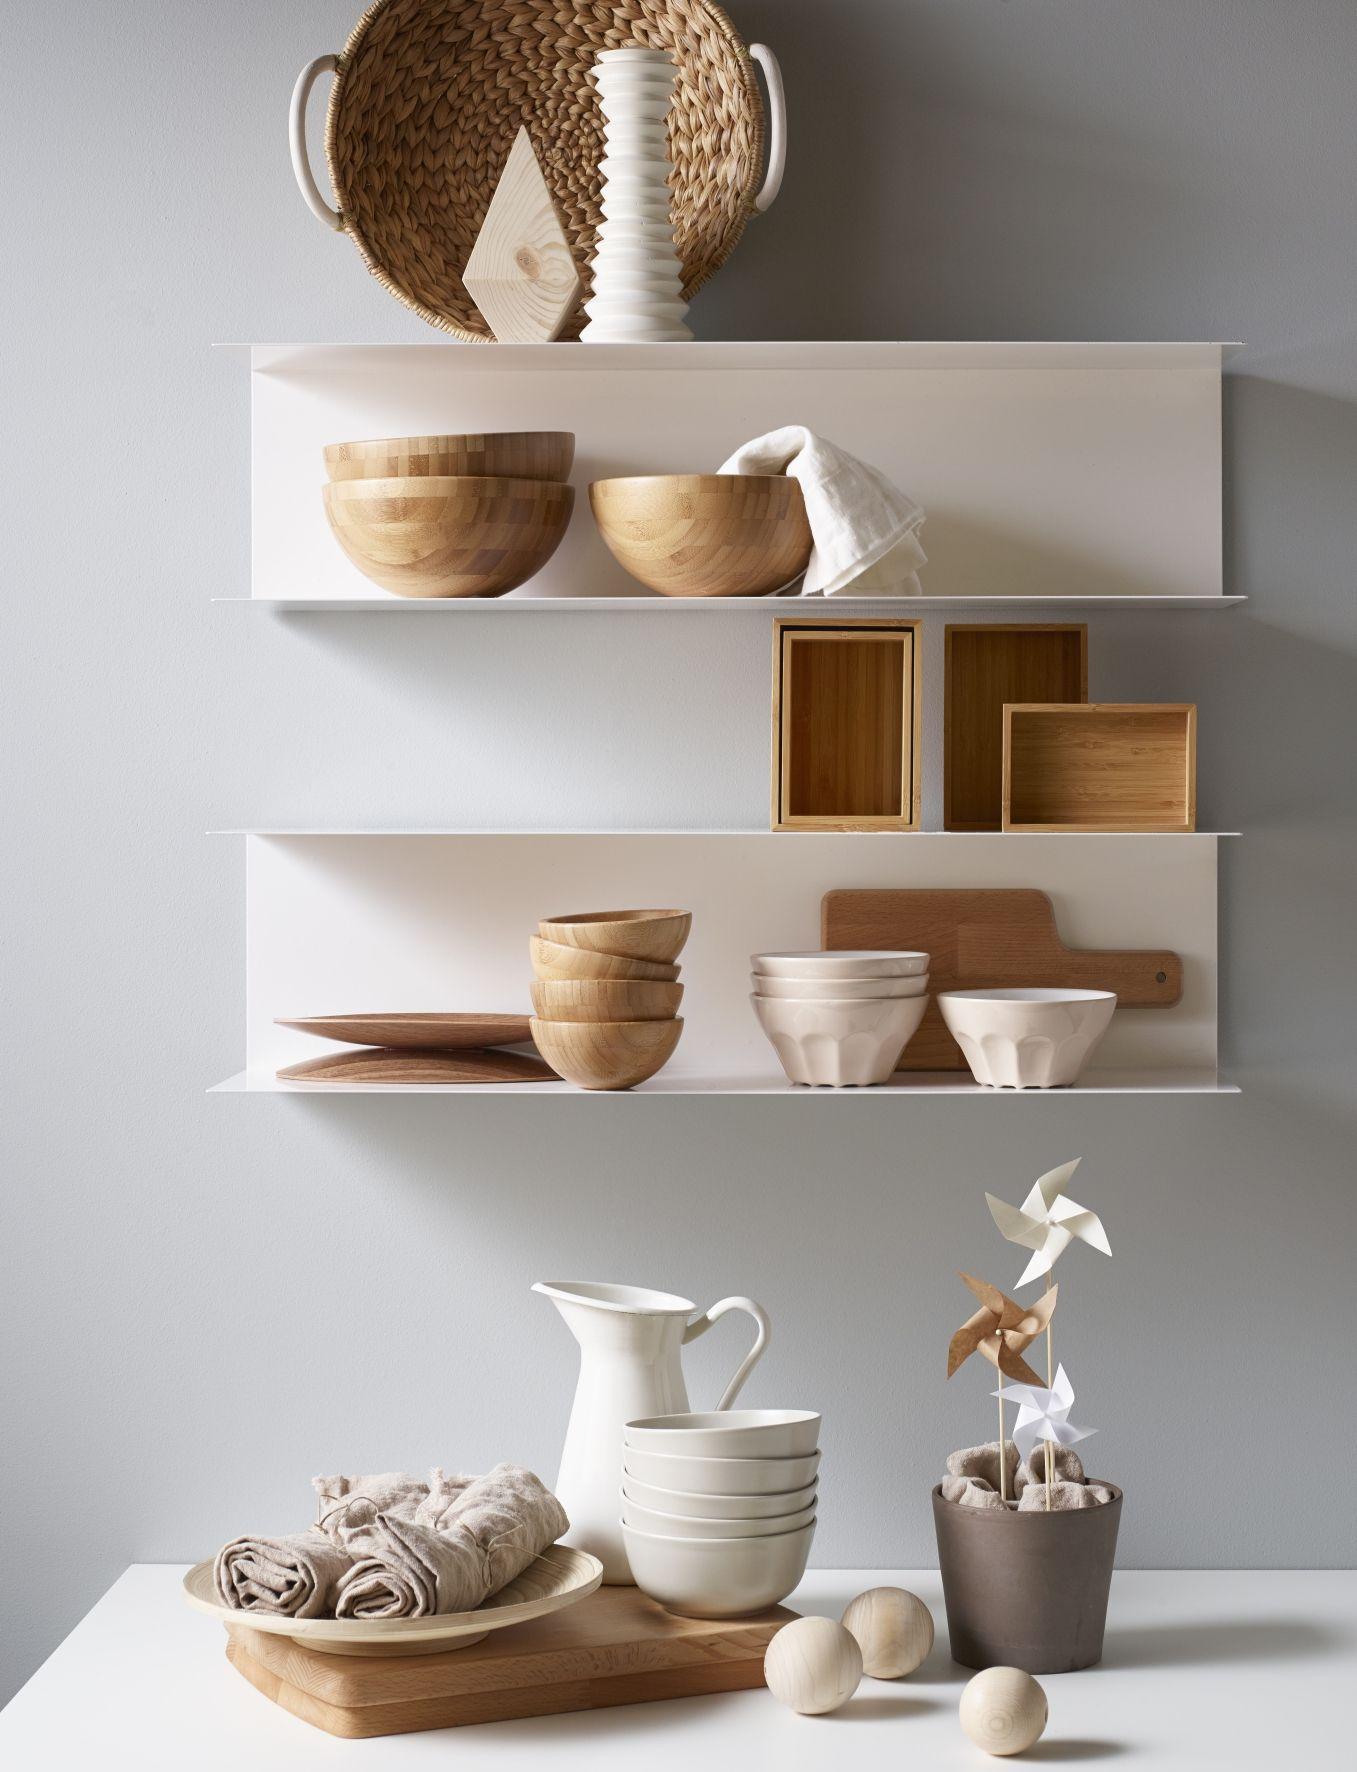 Ikéa Botkyra. Love the simplicity.